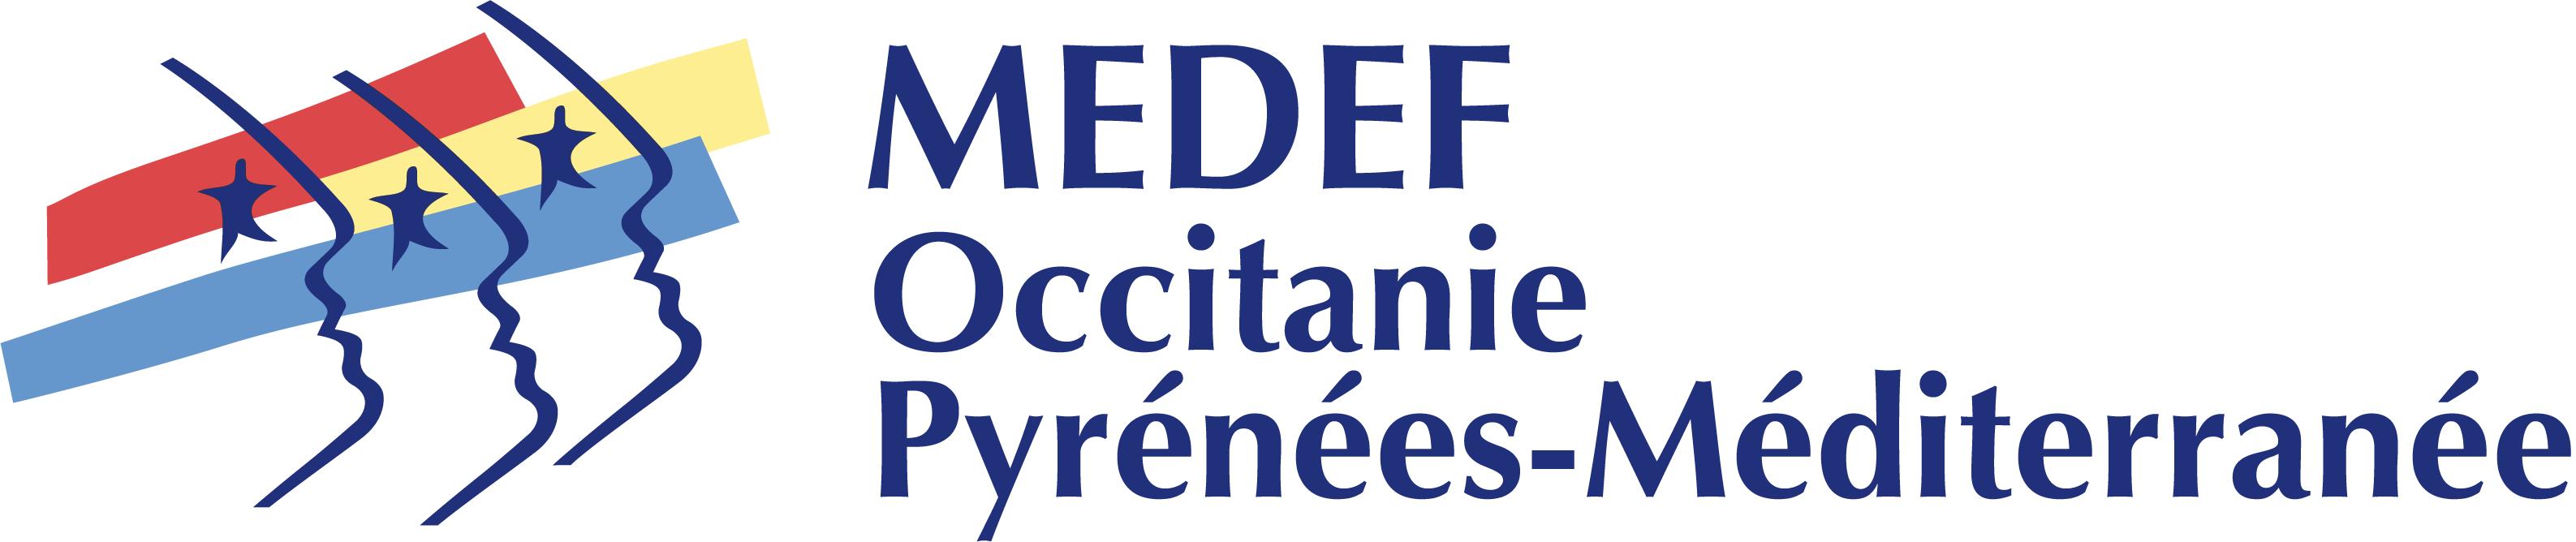 MEDEF Occitanie logo rectangle (1) (1)